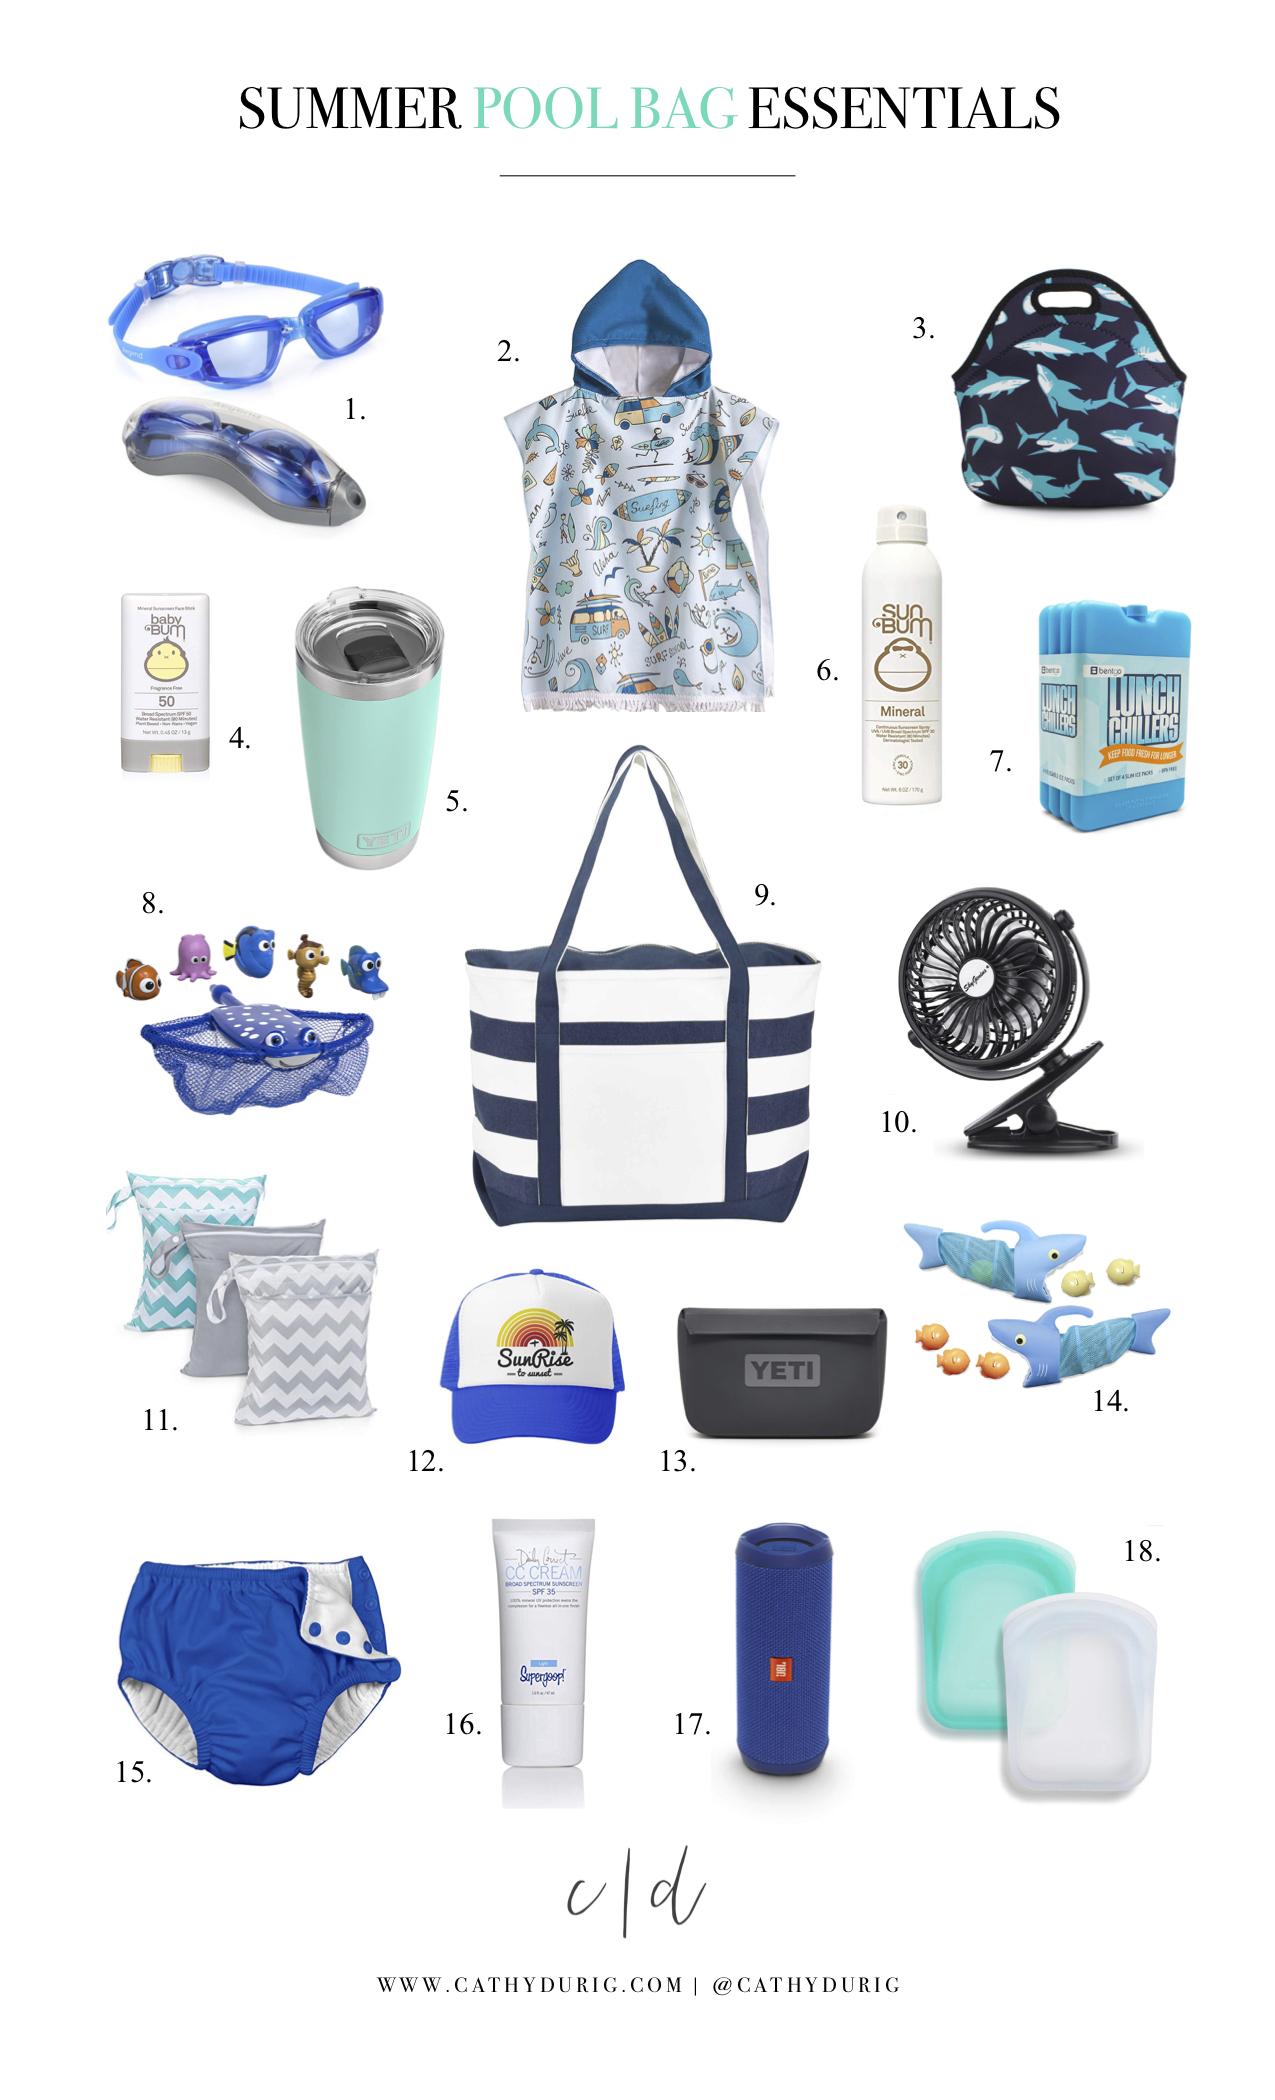 Summer Pool Essentials.jpg